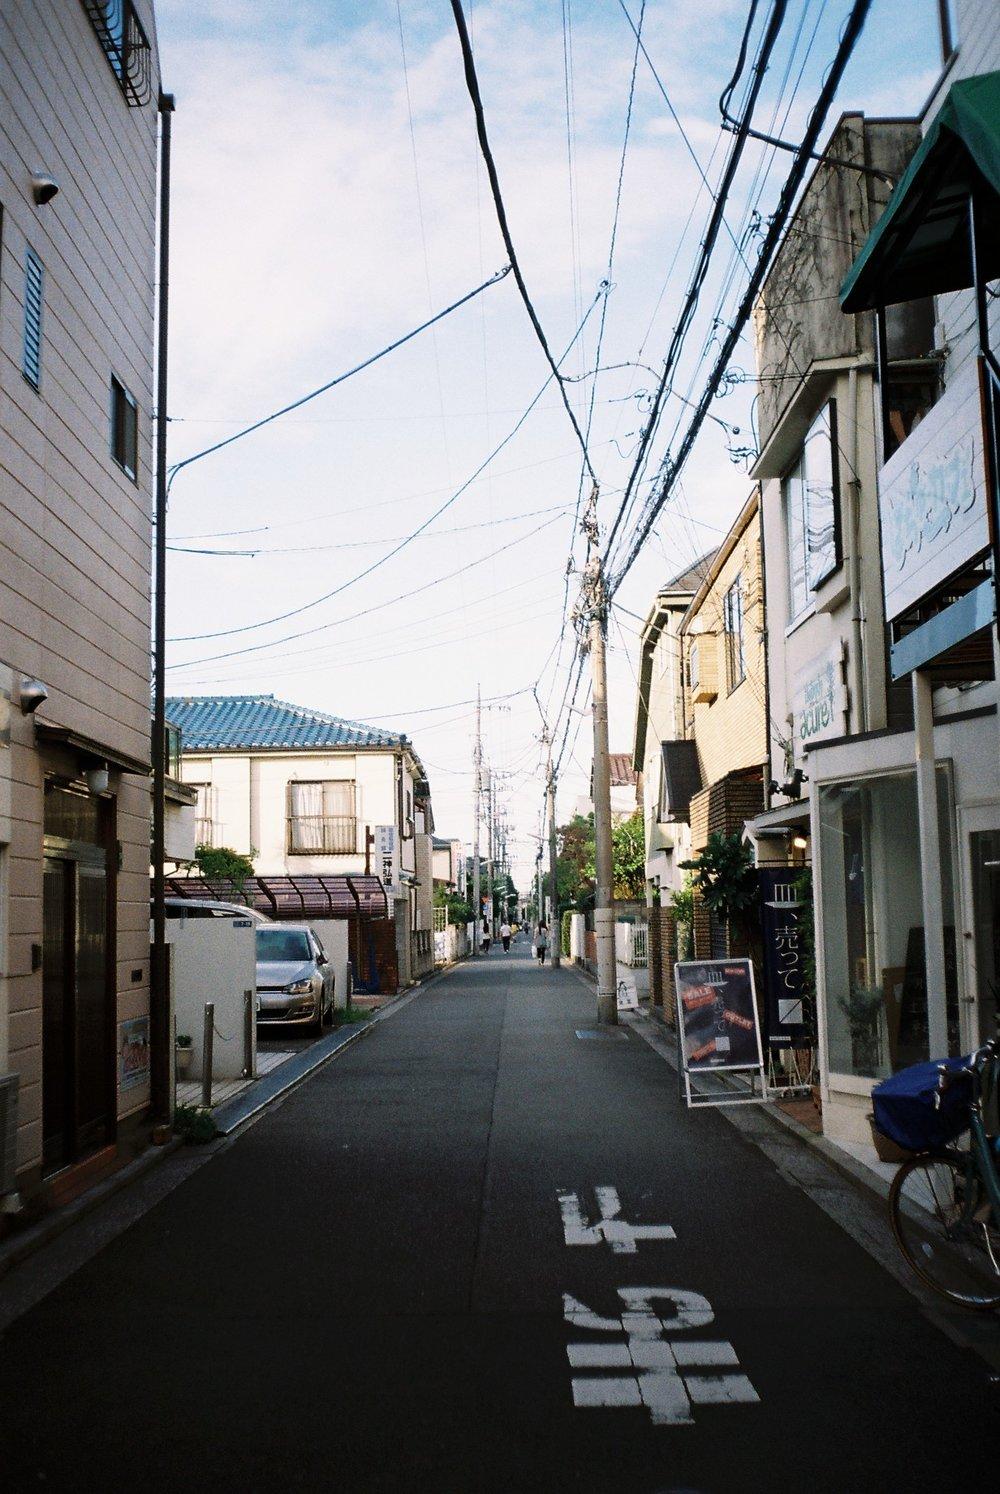 07-JAPON-argentic-Tokyo-septembre-2016-0018.JPG